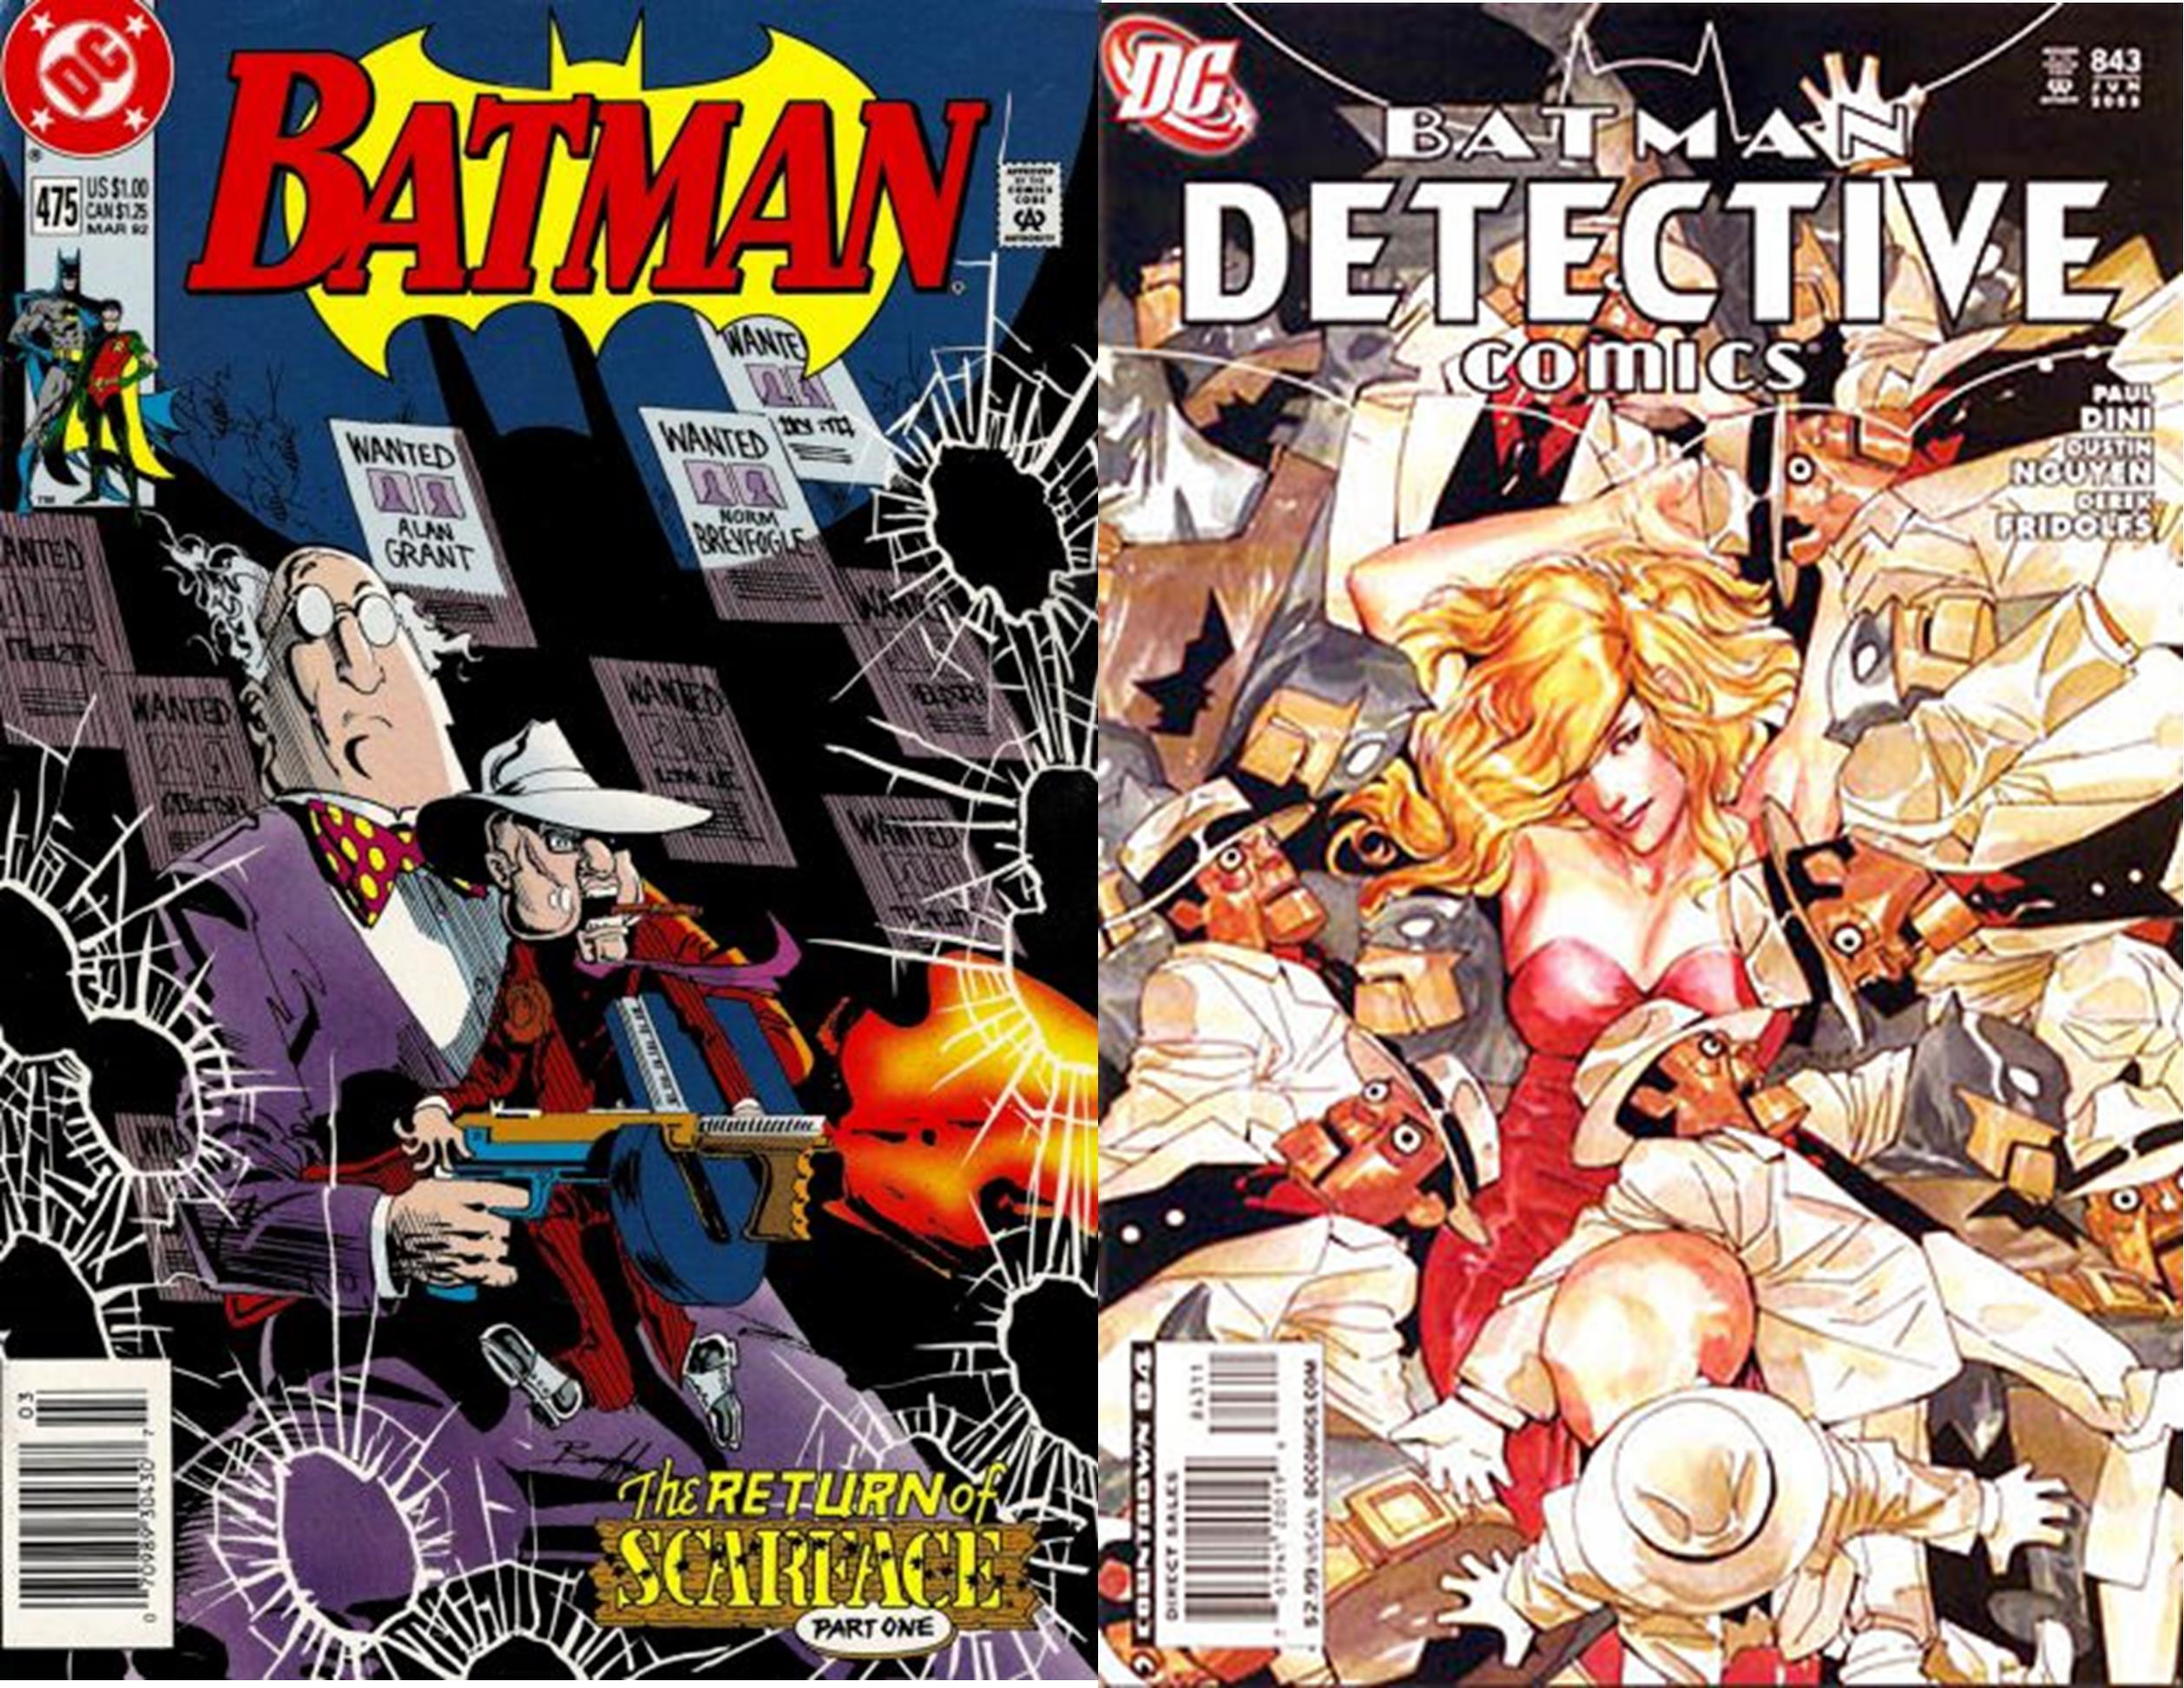 Geek insider, geekinsider, geekinsider. Com,, batman villains we want on the big screen, comics